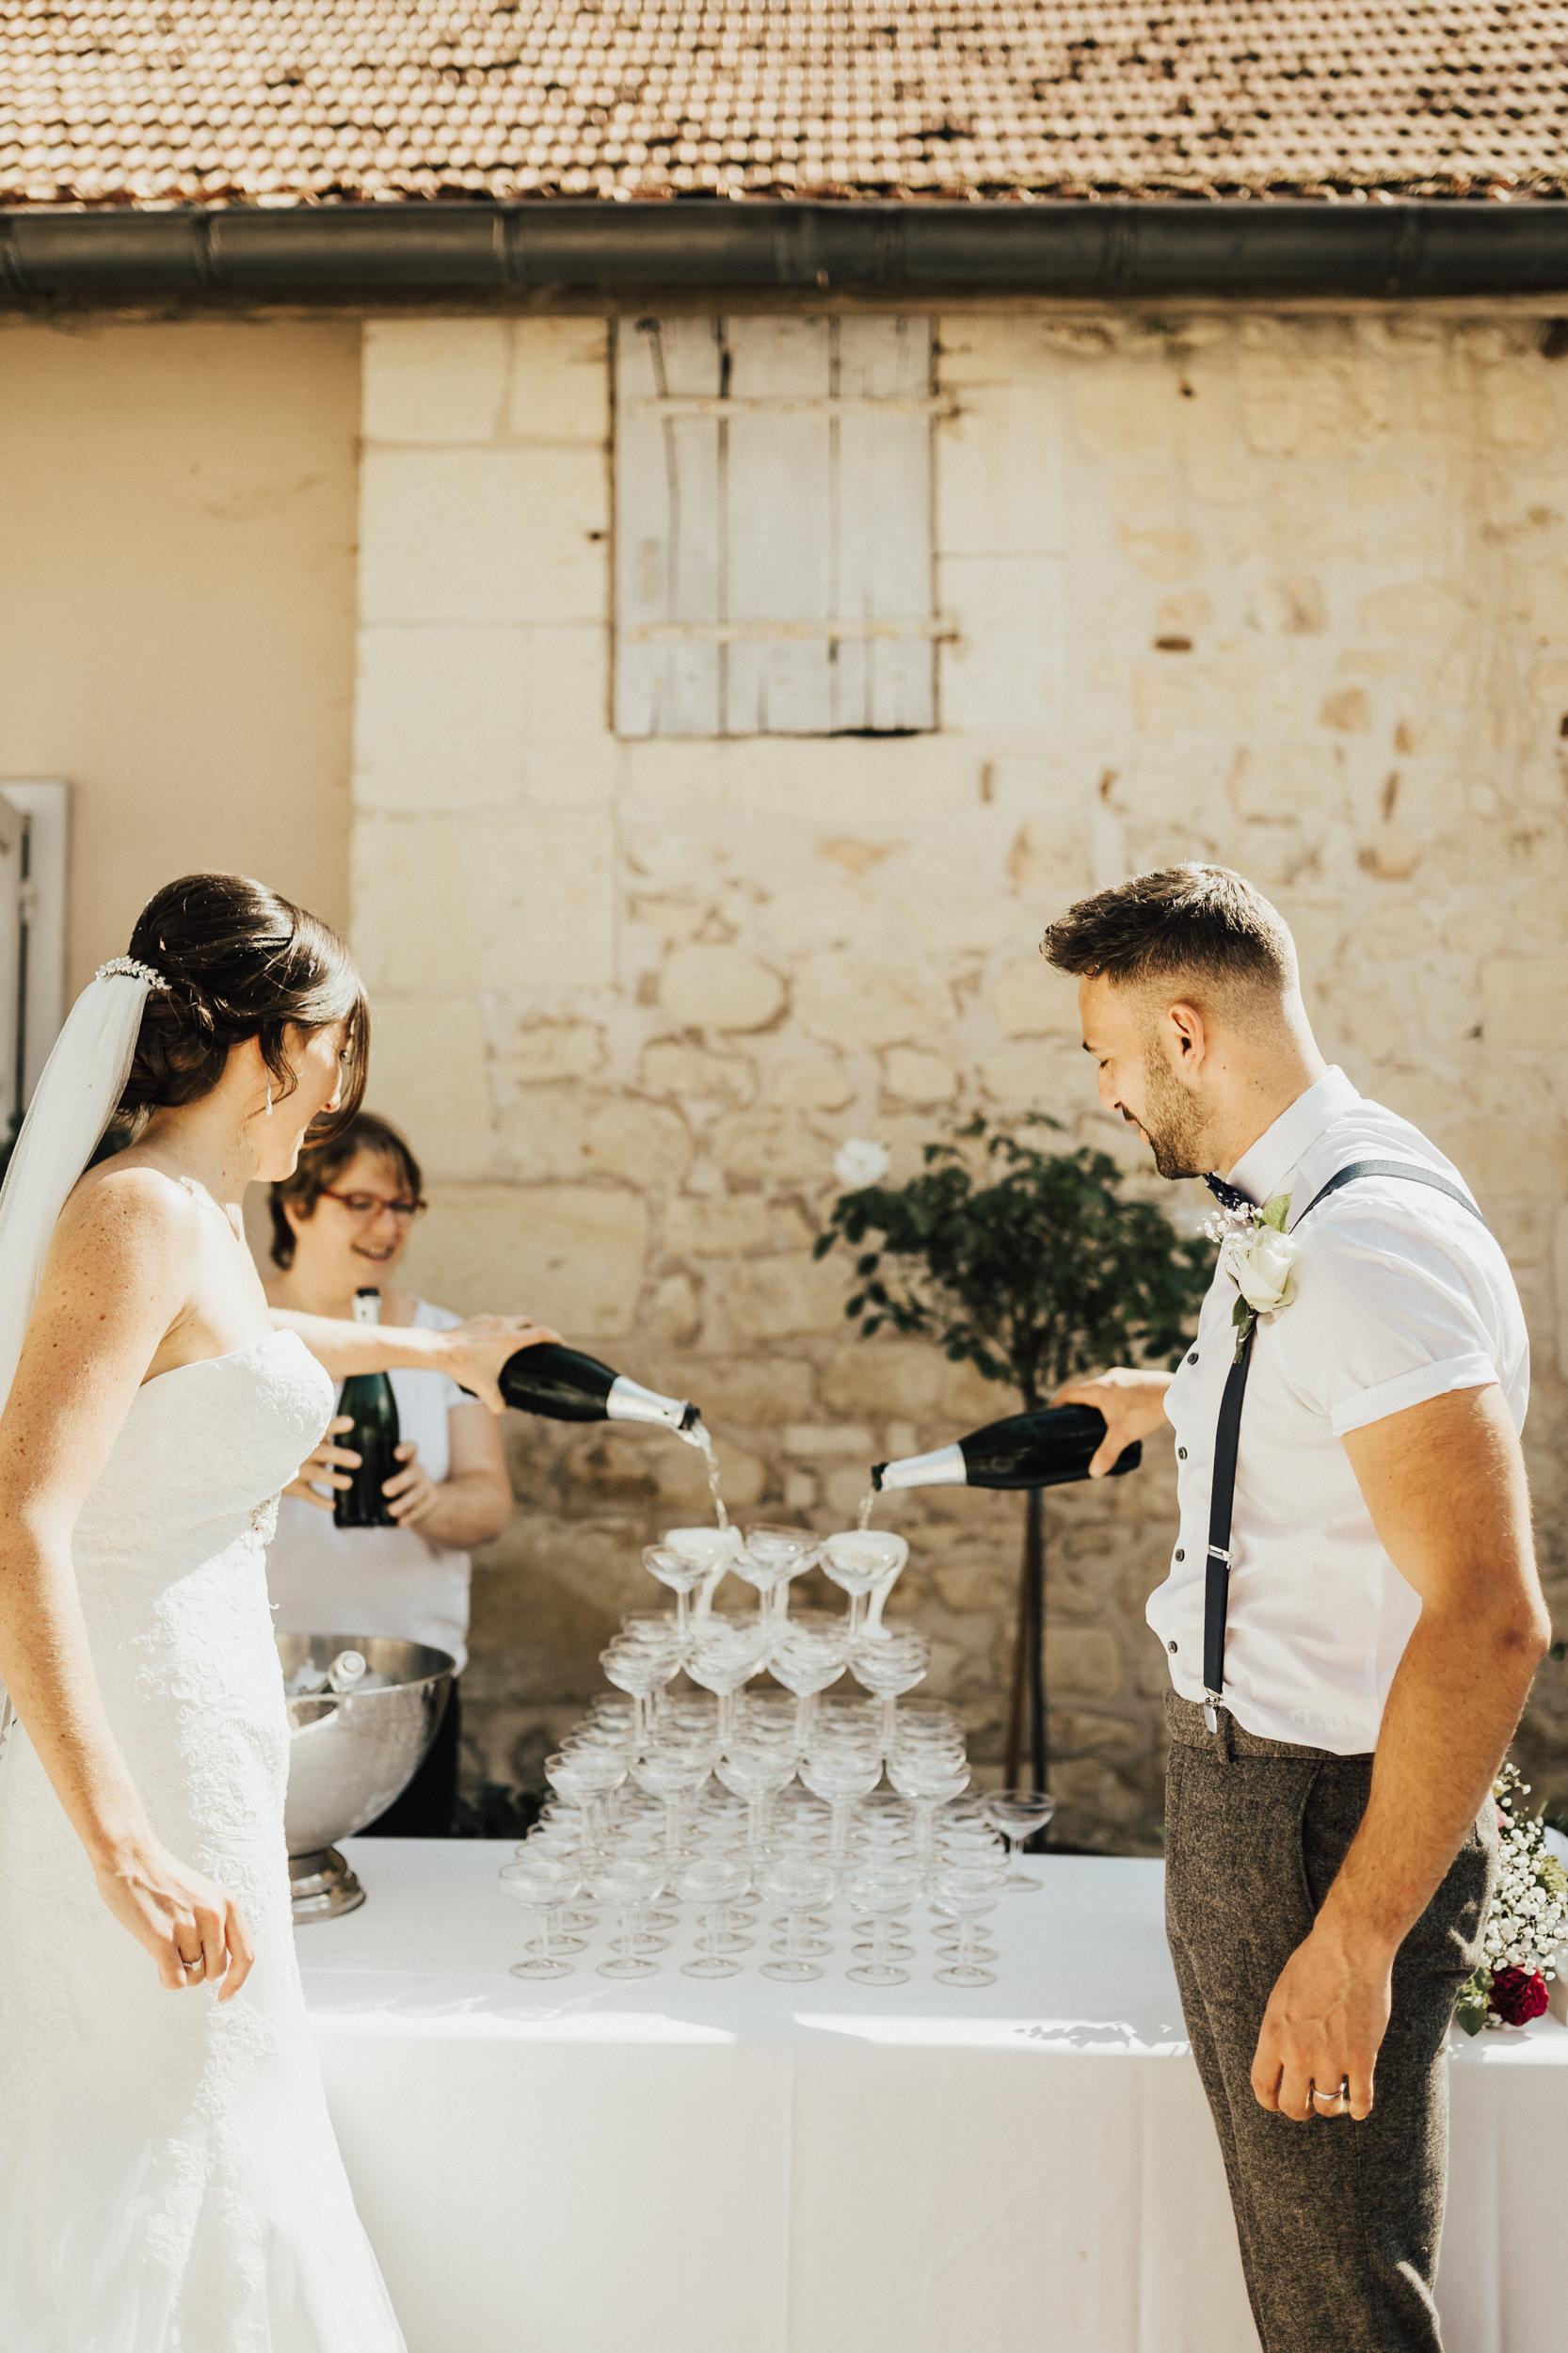 Amy-Zac-Destination-Wedding-France-Manoir-Foulquetiere-Darina-Stoda-Photography-52.jpg